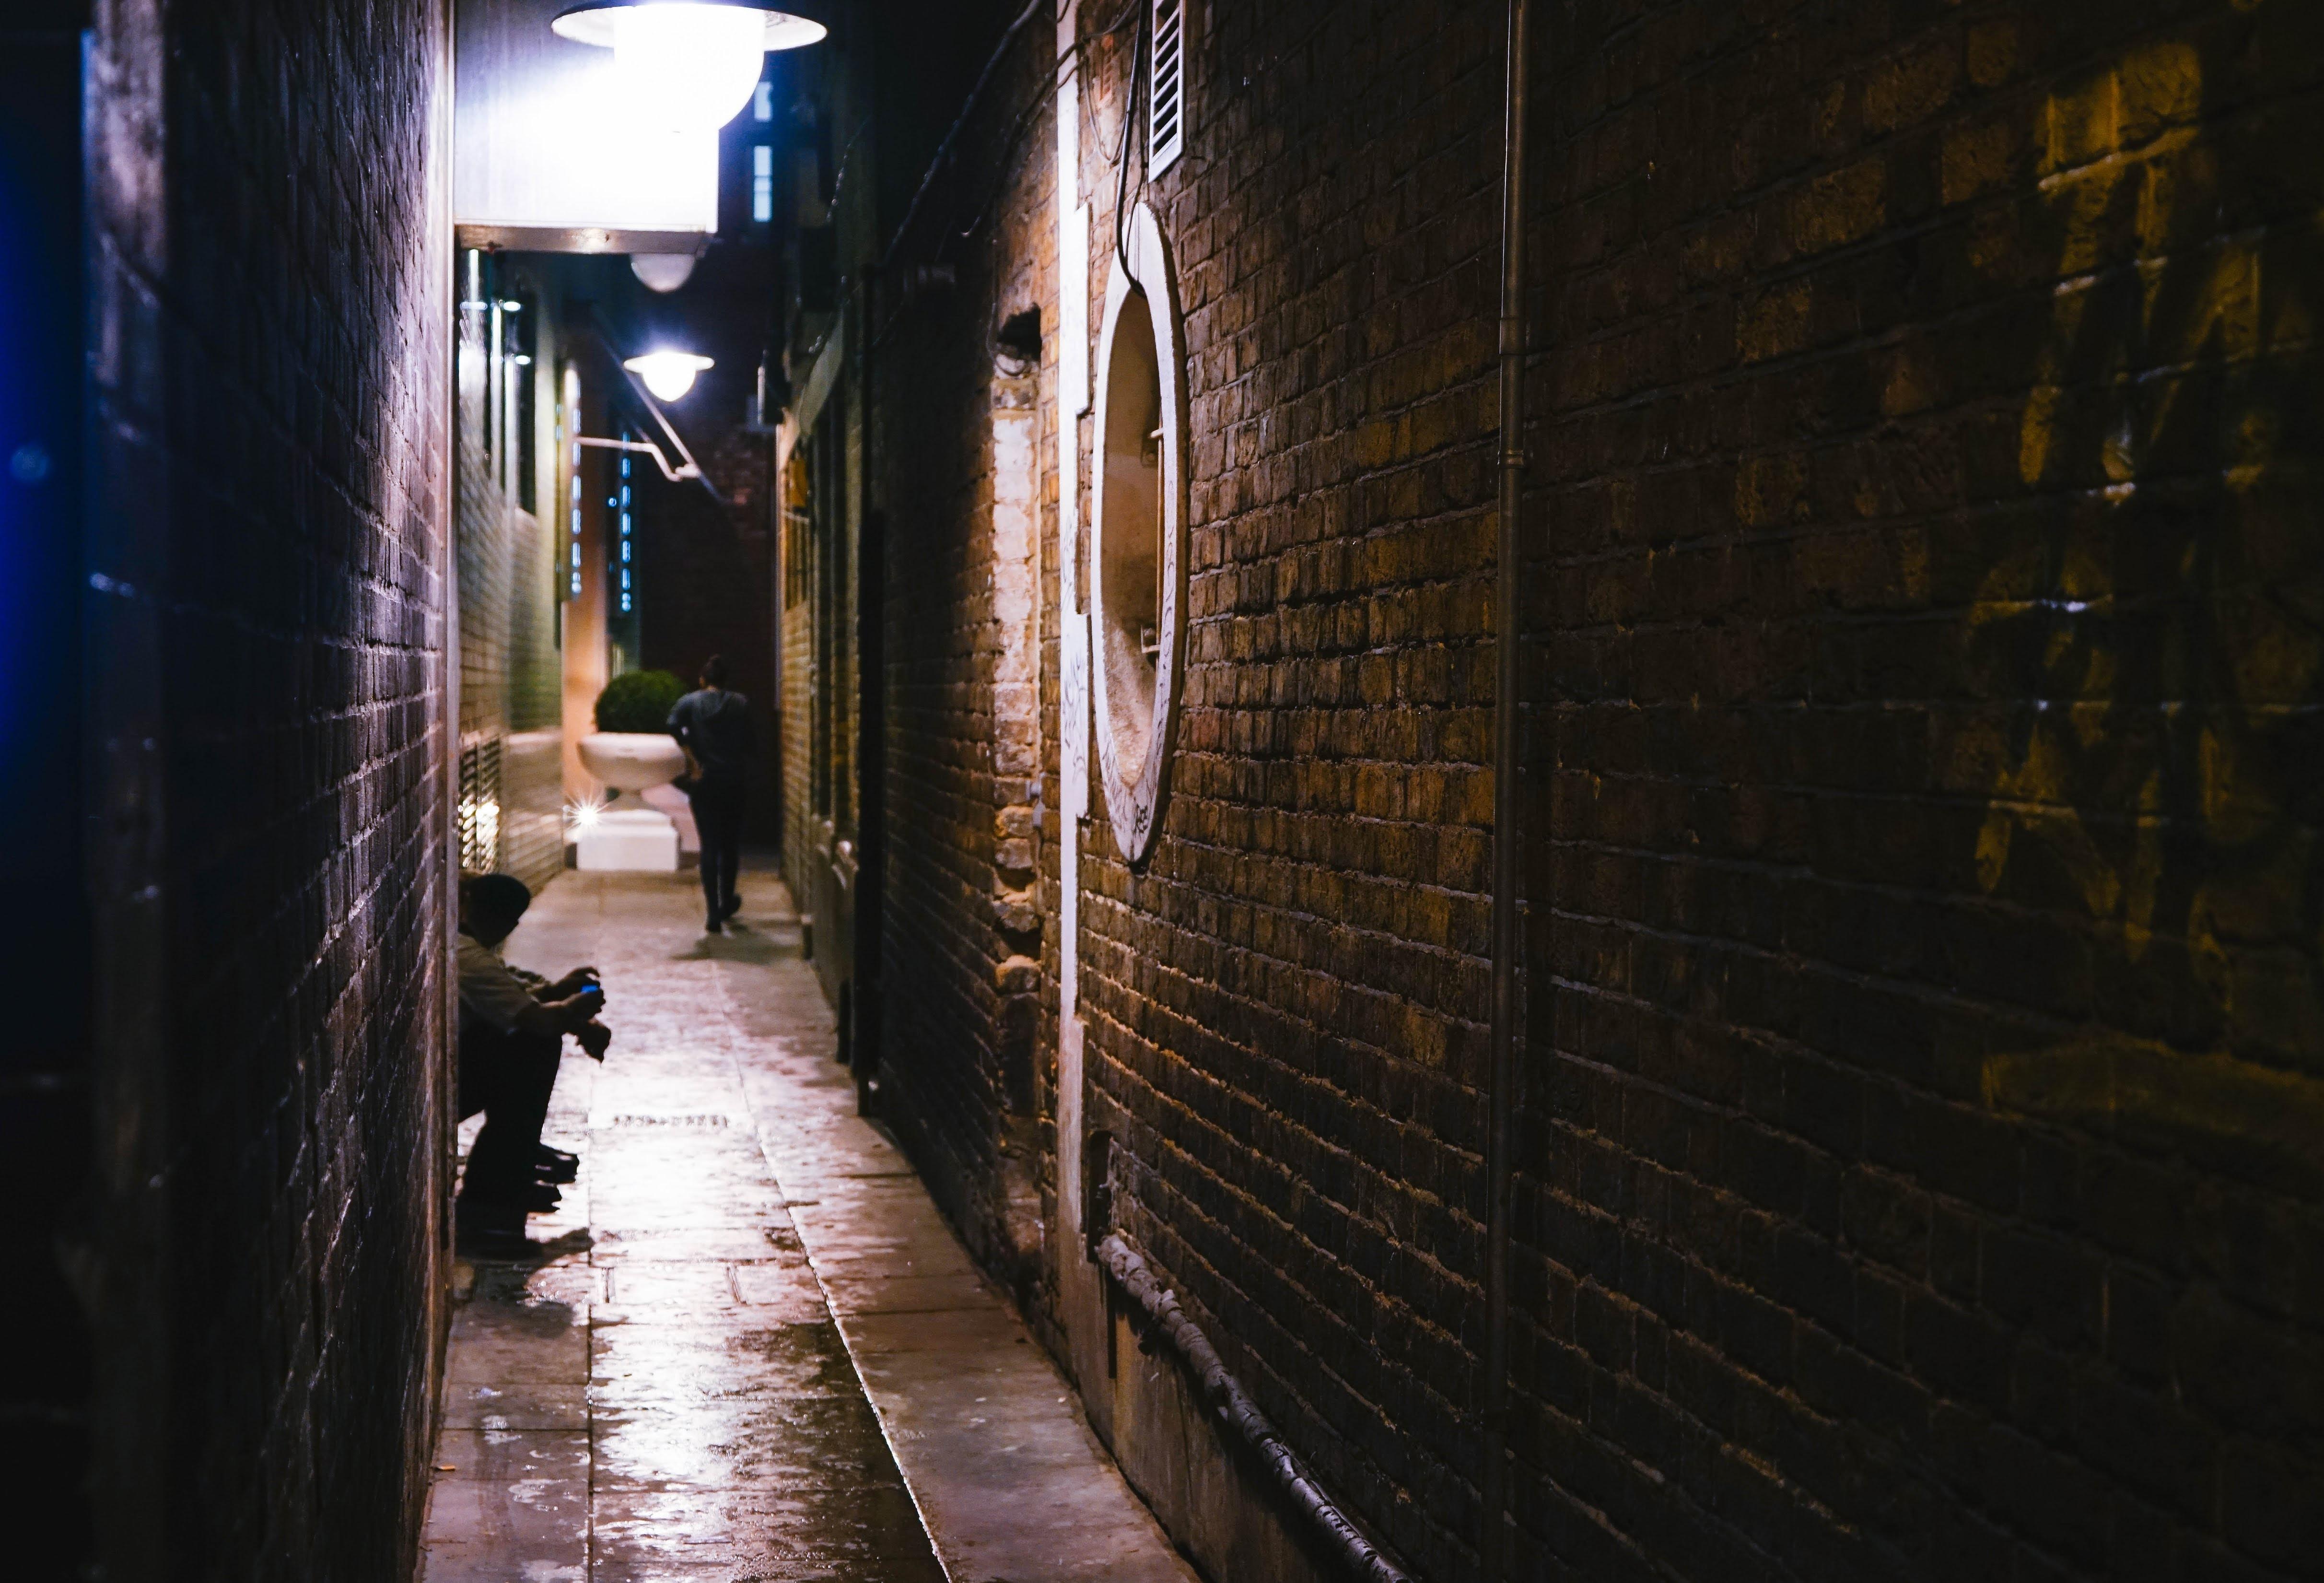 person sitting on road between buildings